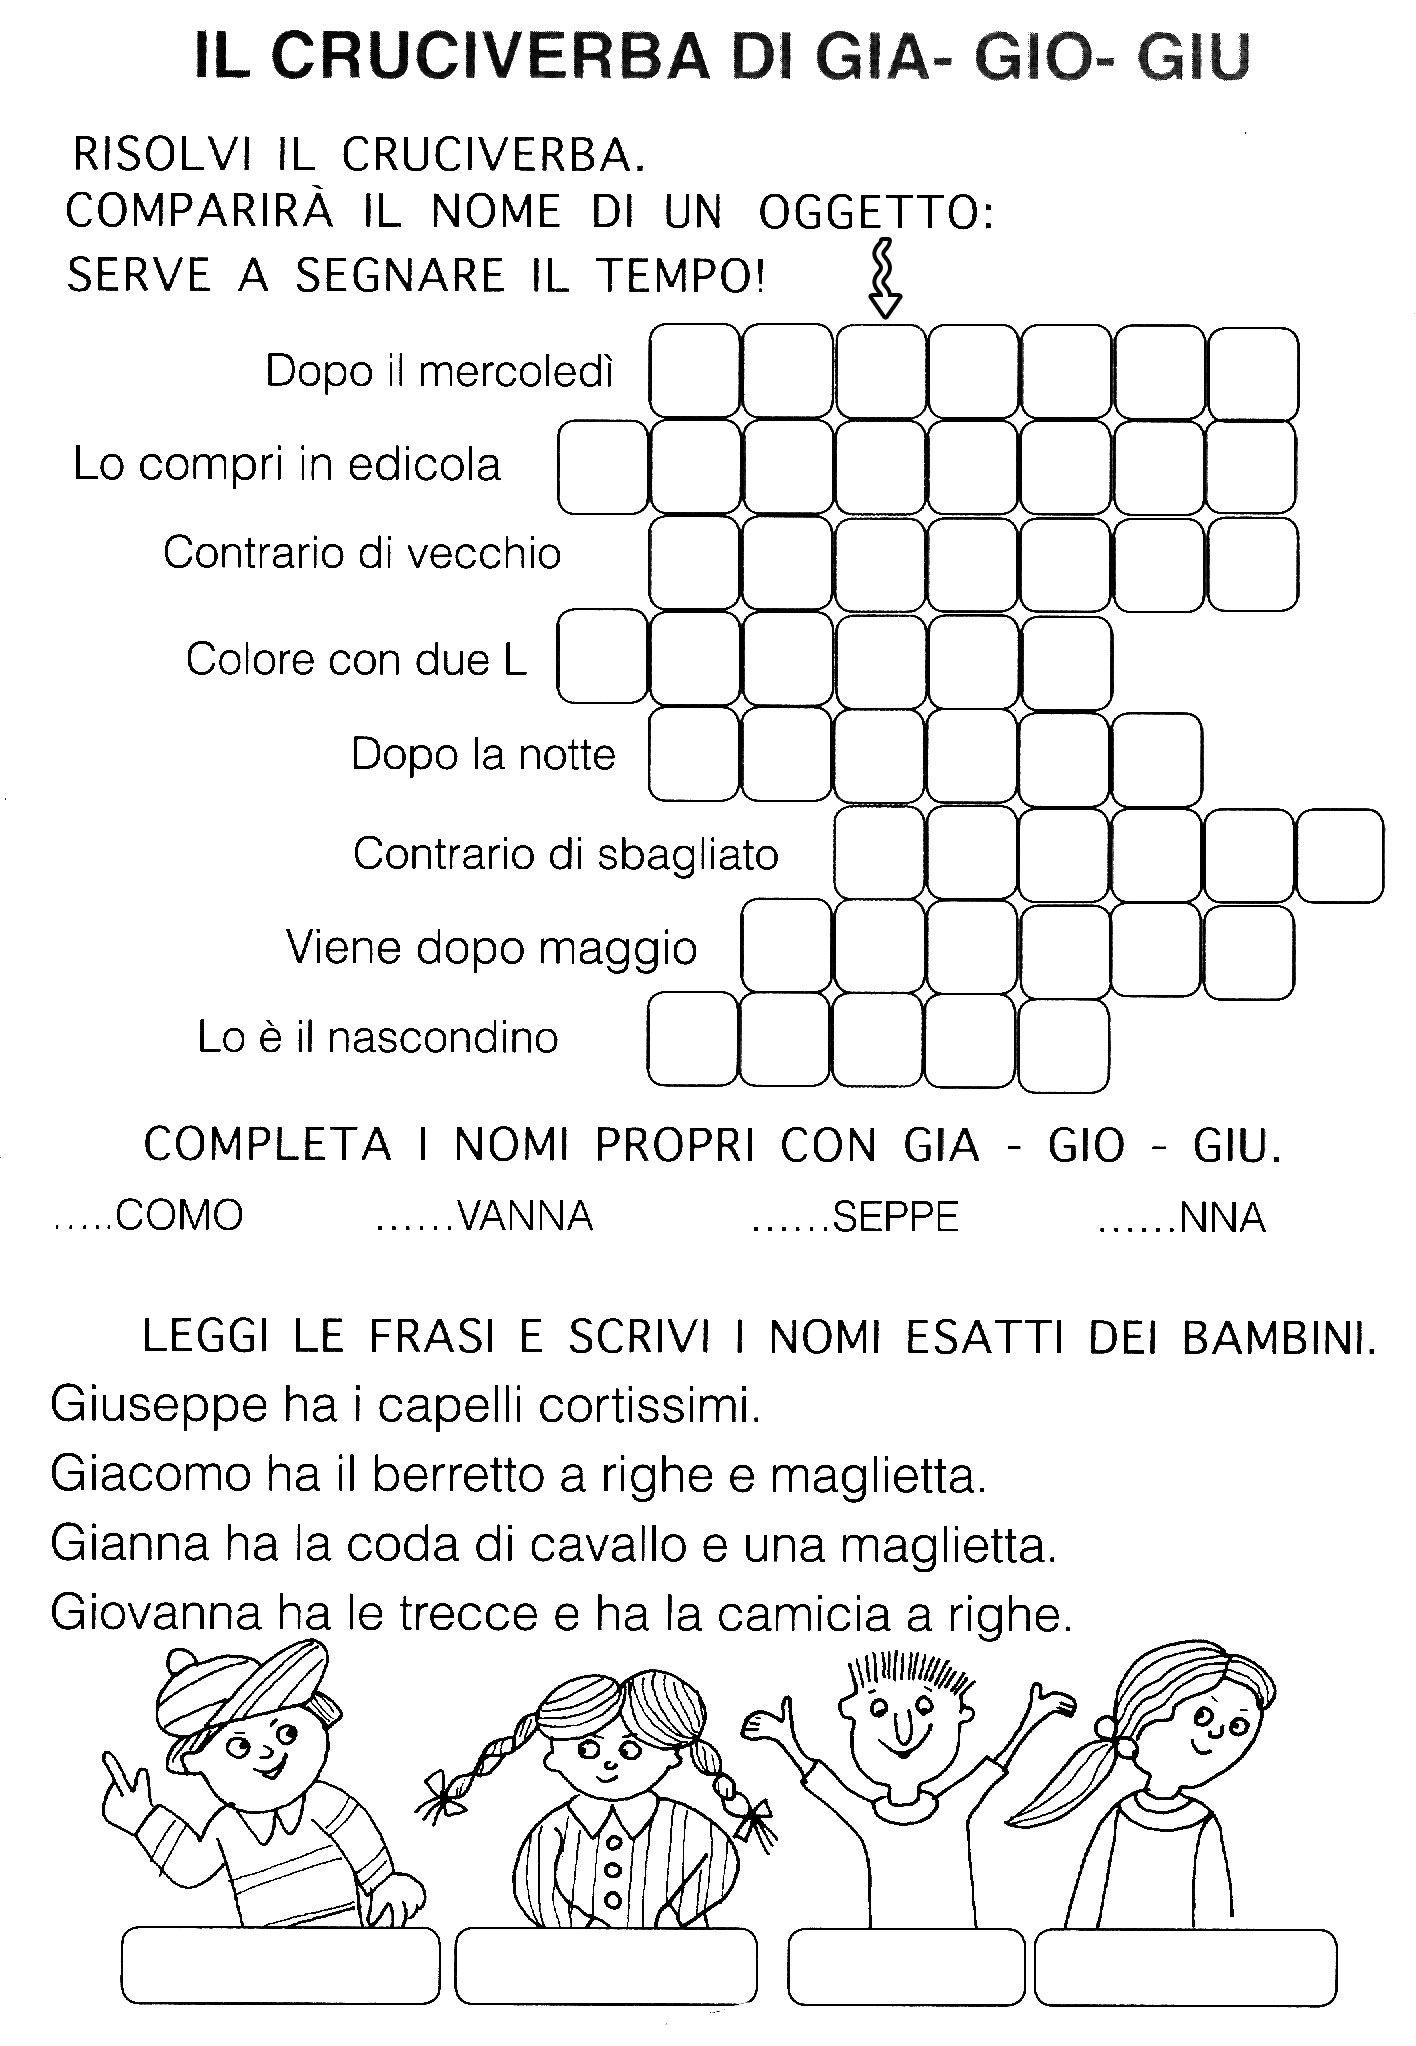 Gia gio giu ortografia primo ciclo pinterest school learning italian and italian grammar for Parole con gi